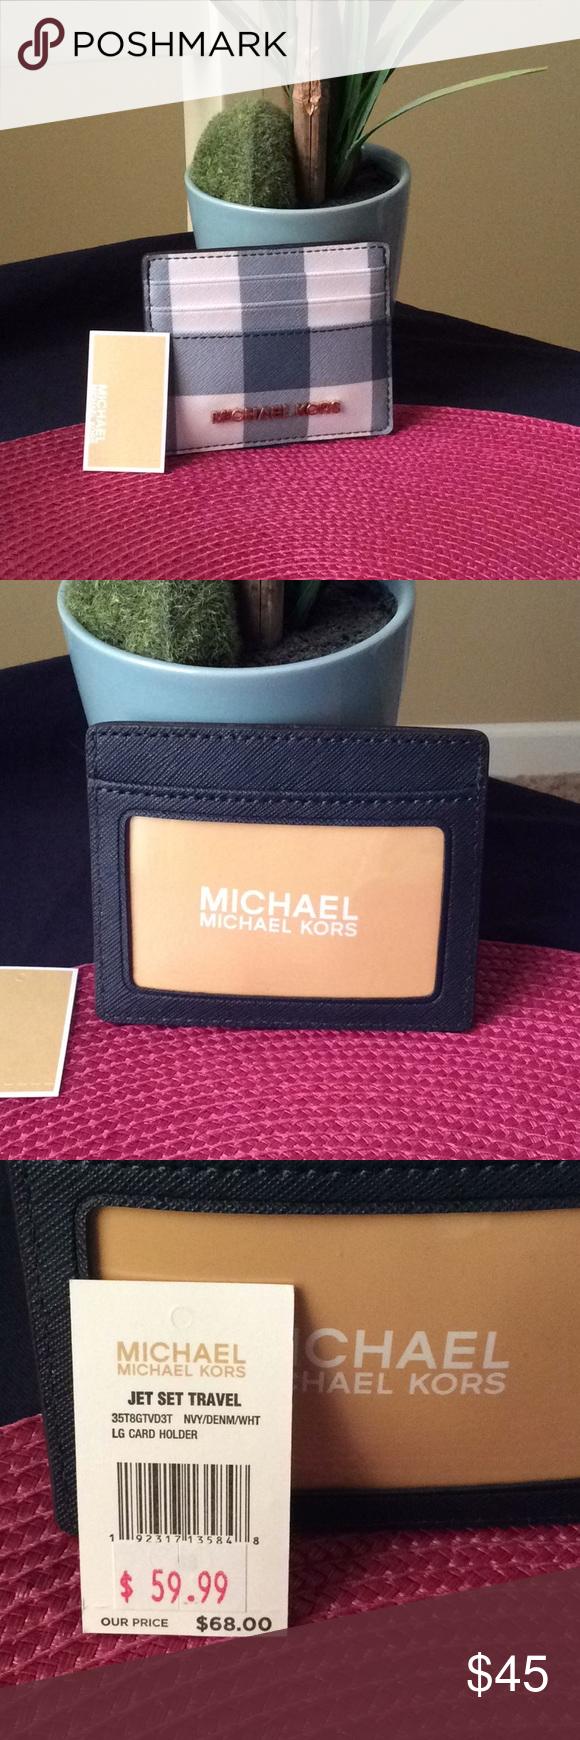 3acbeda763b0 MK Card holder blue plaid. NWT MK Card holder blue plaid. Gold logos ...